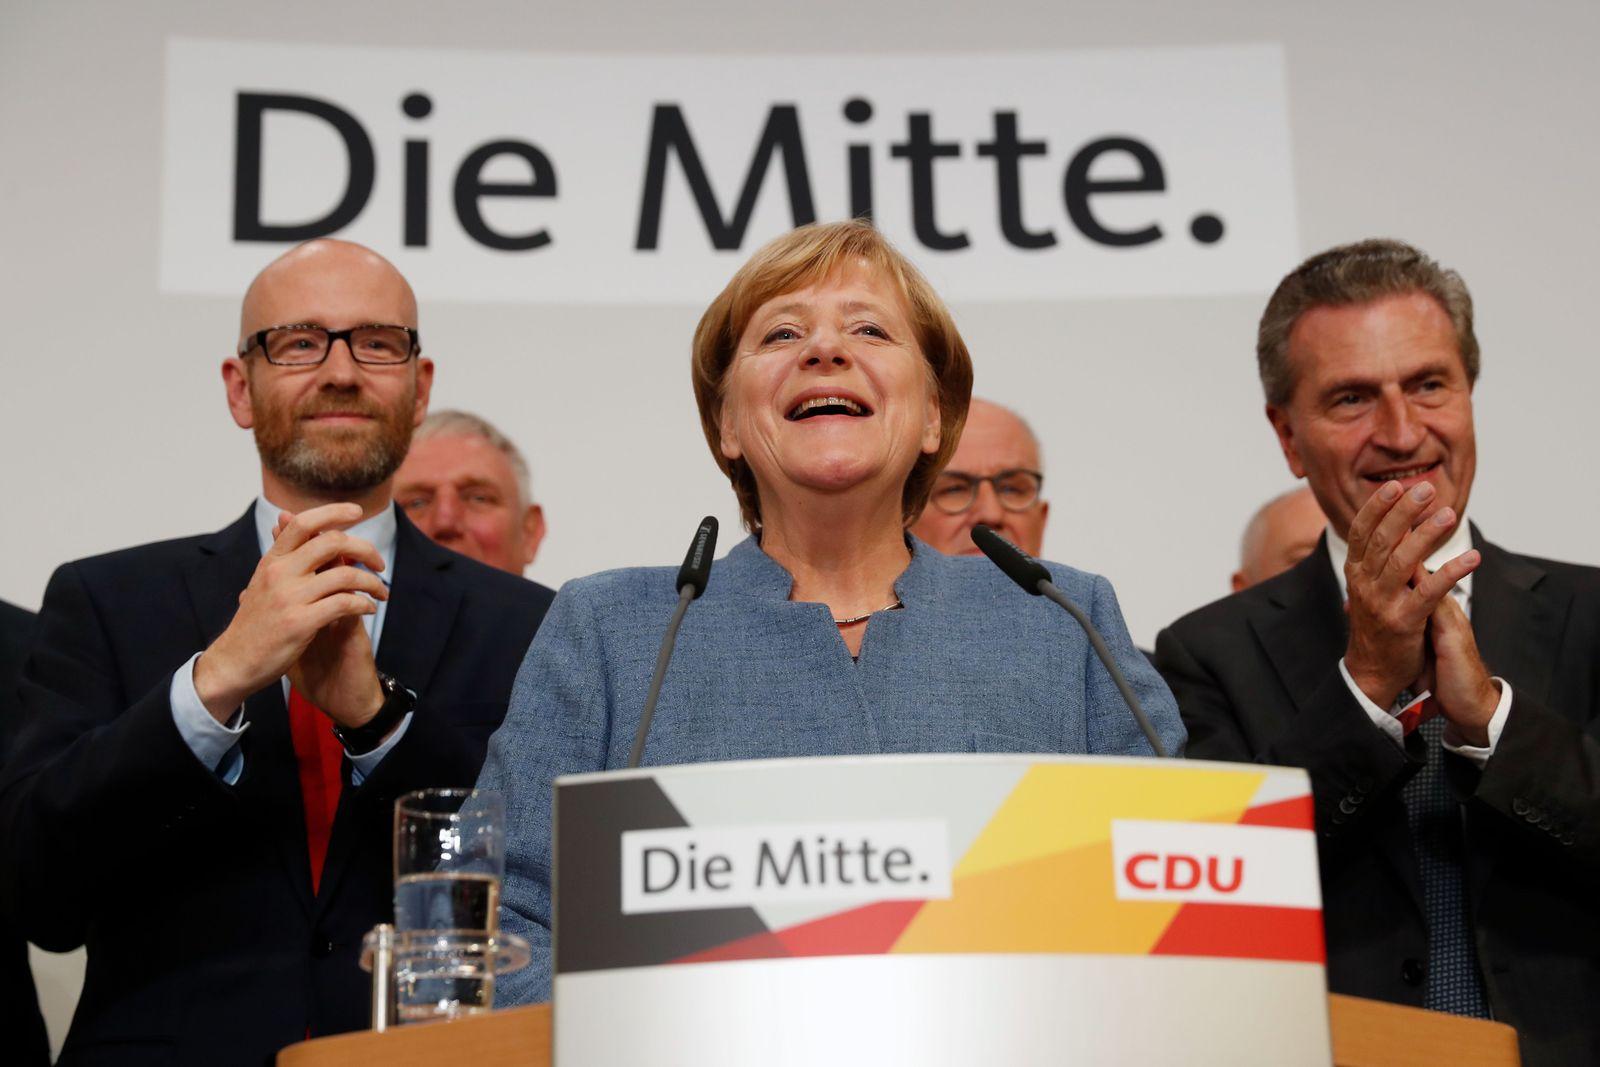 bundestagswahl/ 2017/ CDU/ Merkel